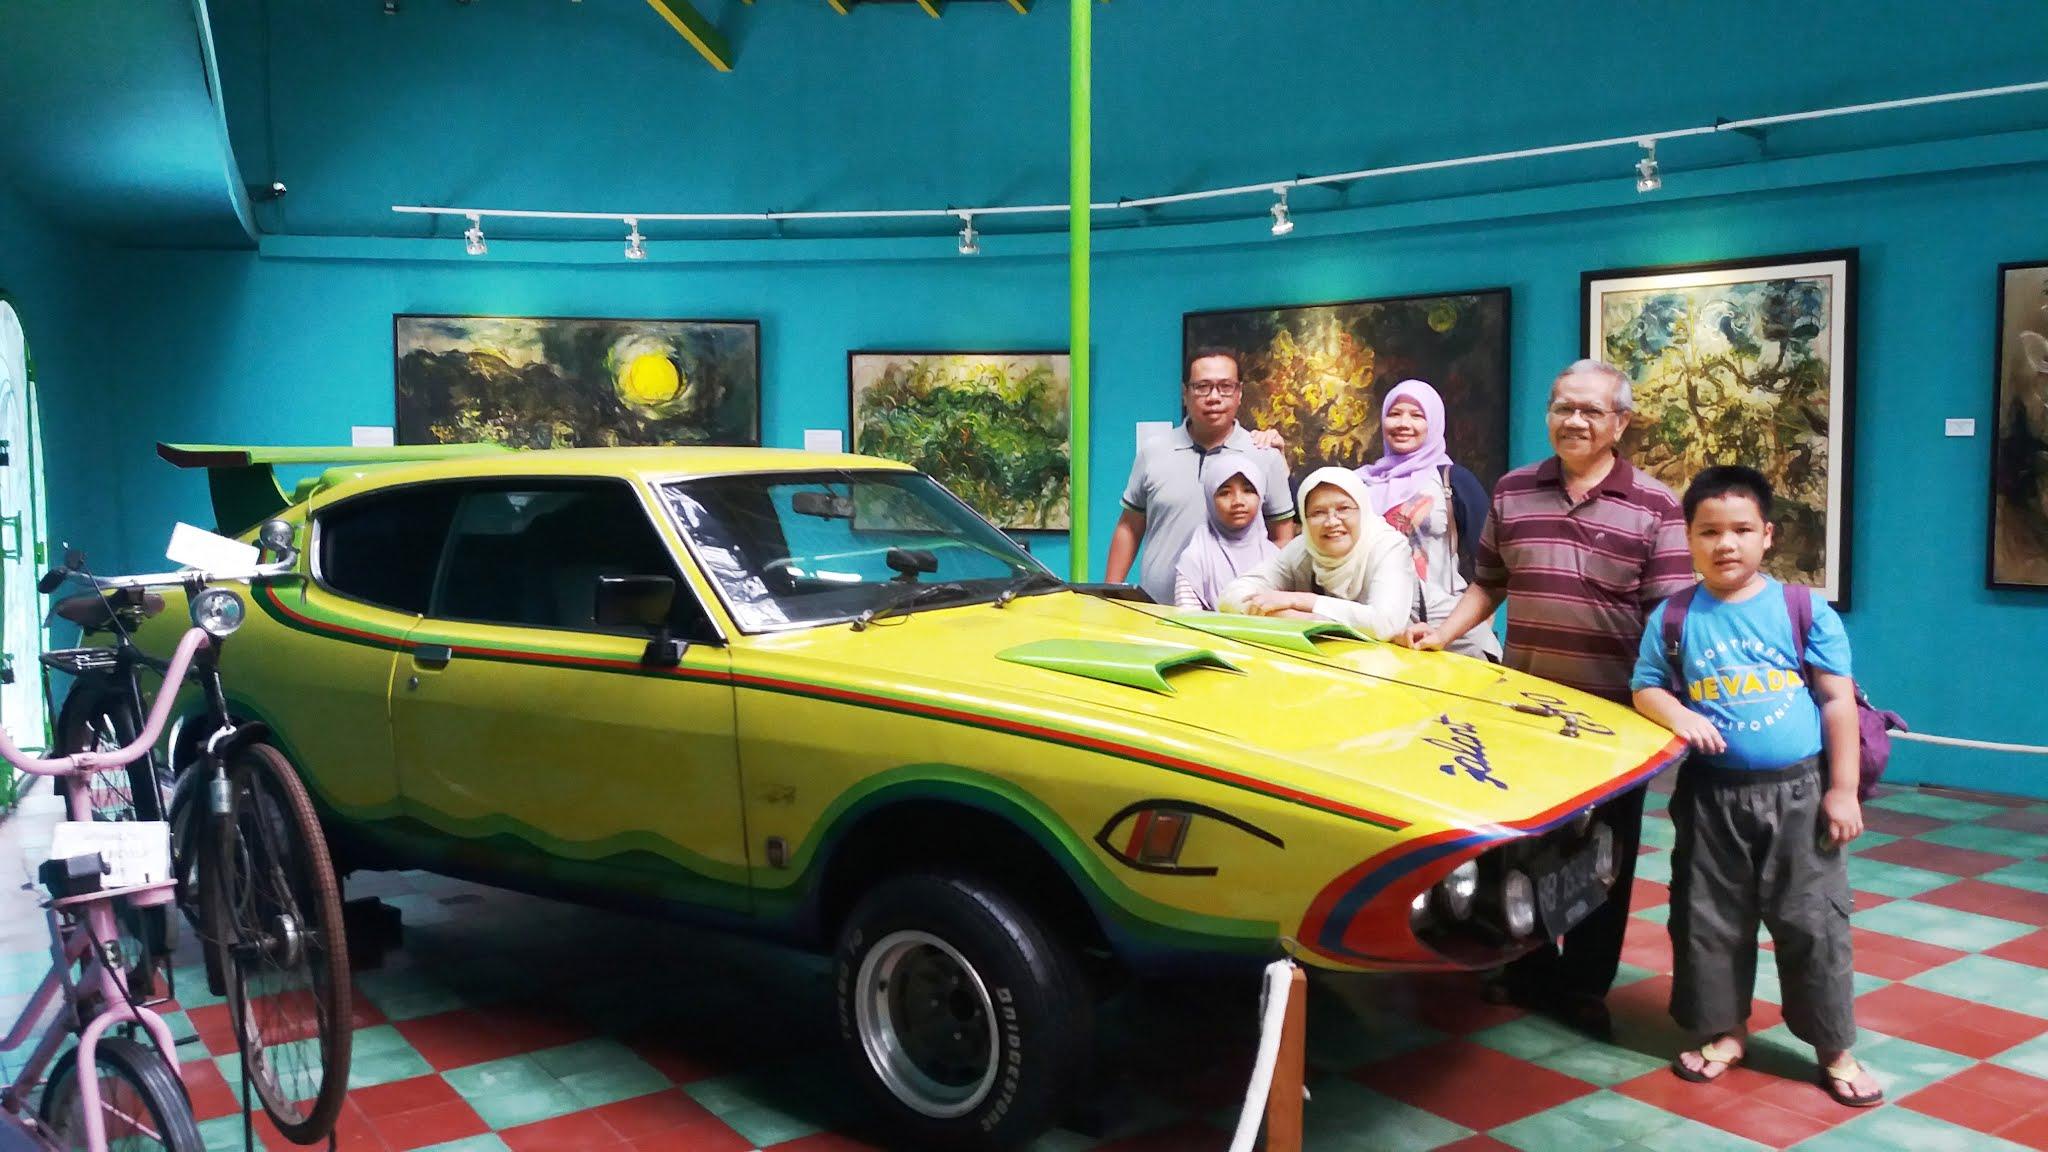 menikmati karya maestro lukis indonesia di museum affandi yogyakarta nurul sufitri travel blogger lifestyle review